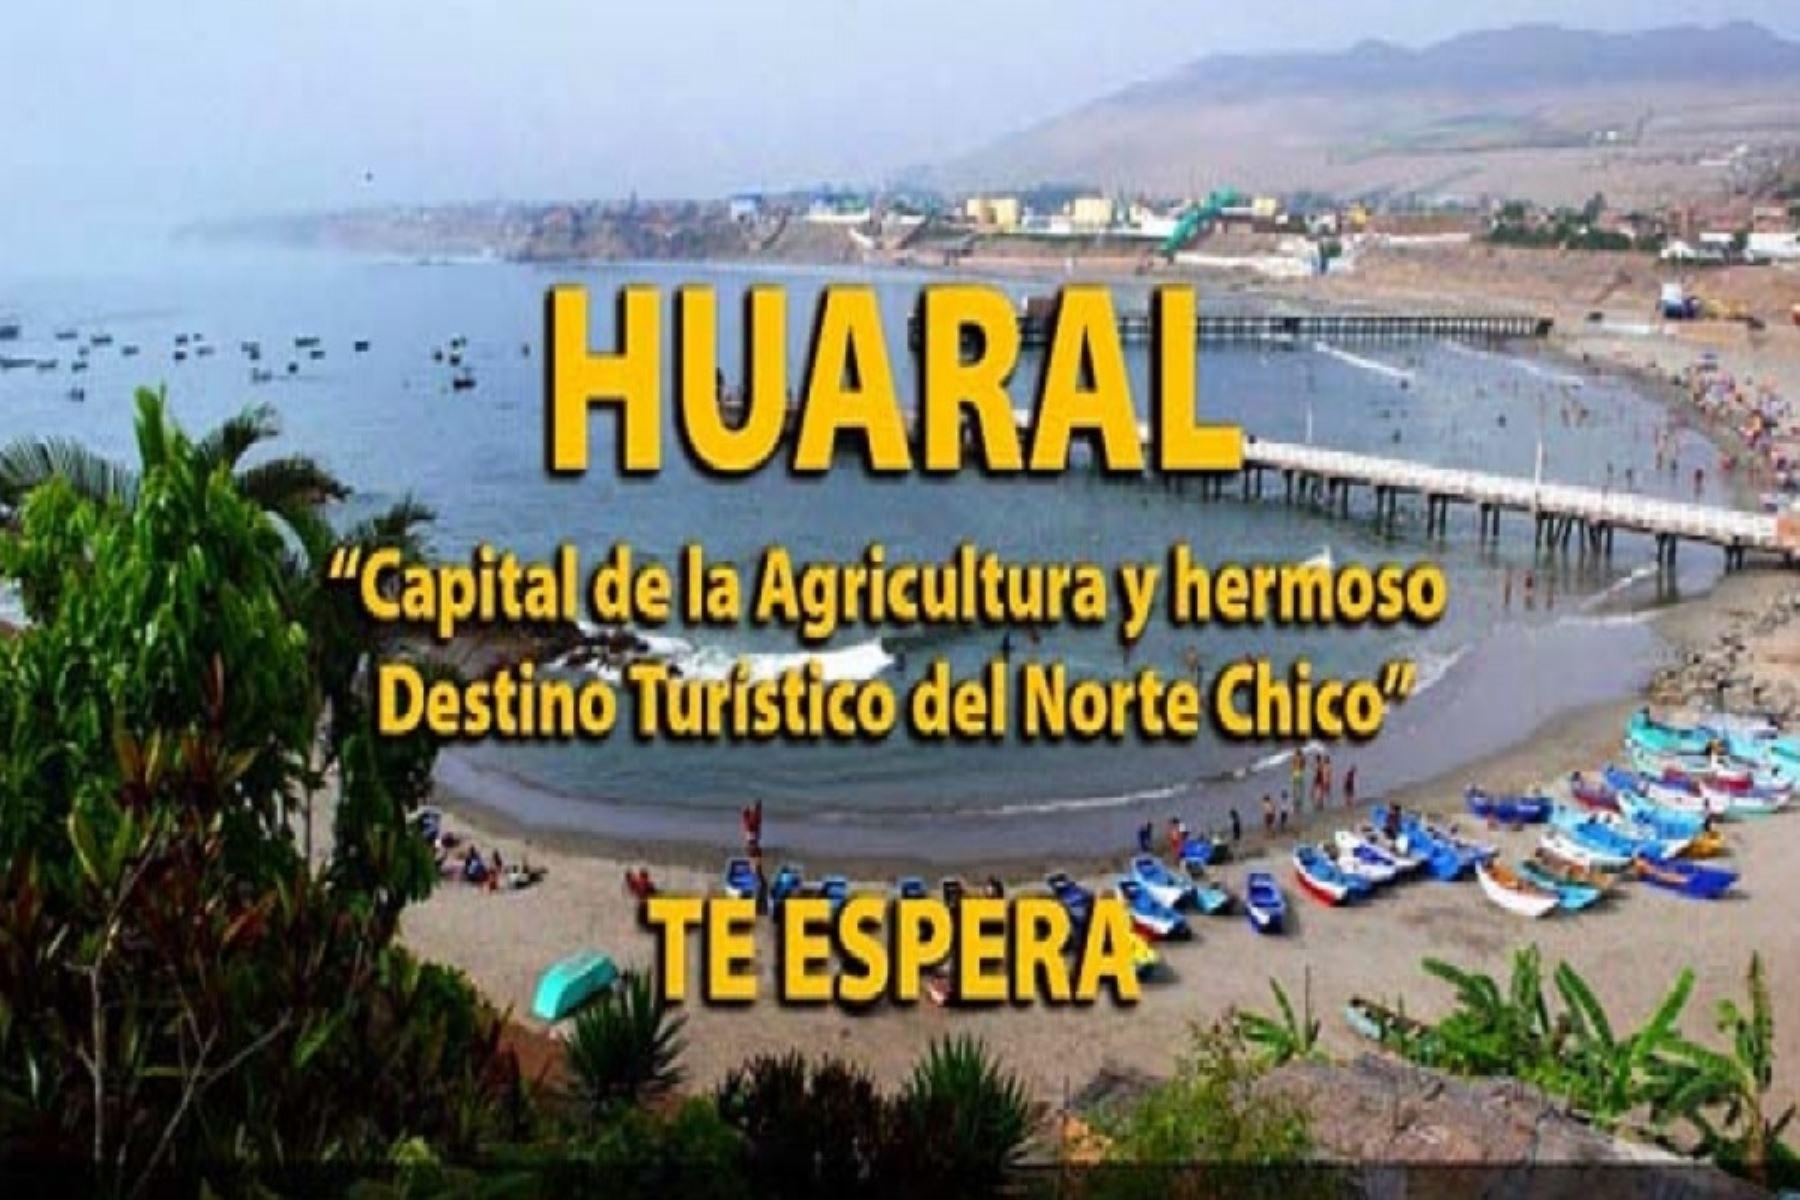 Huaral ofrece diversos atractivos para visitarla en Semana Santa.